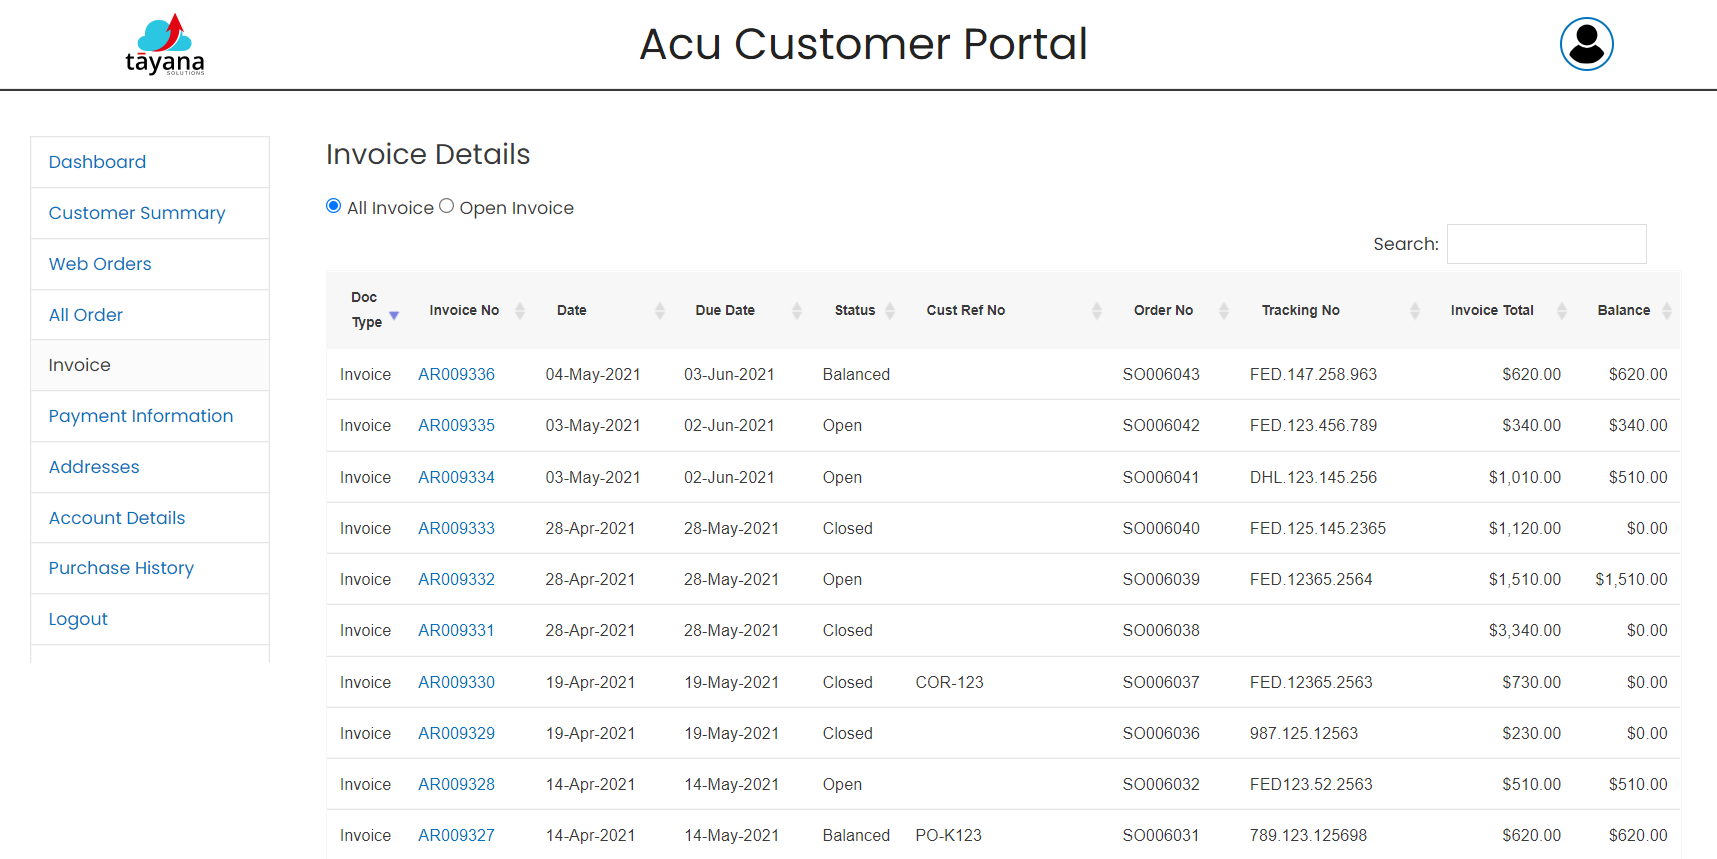 AcuCustomerPortal-Invoices